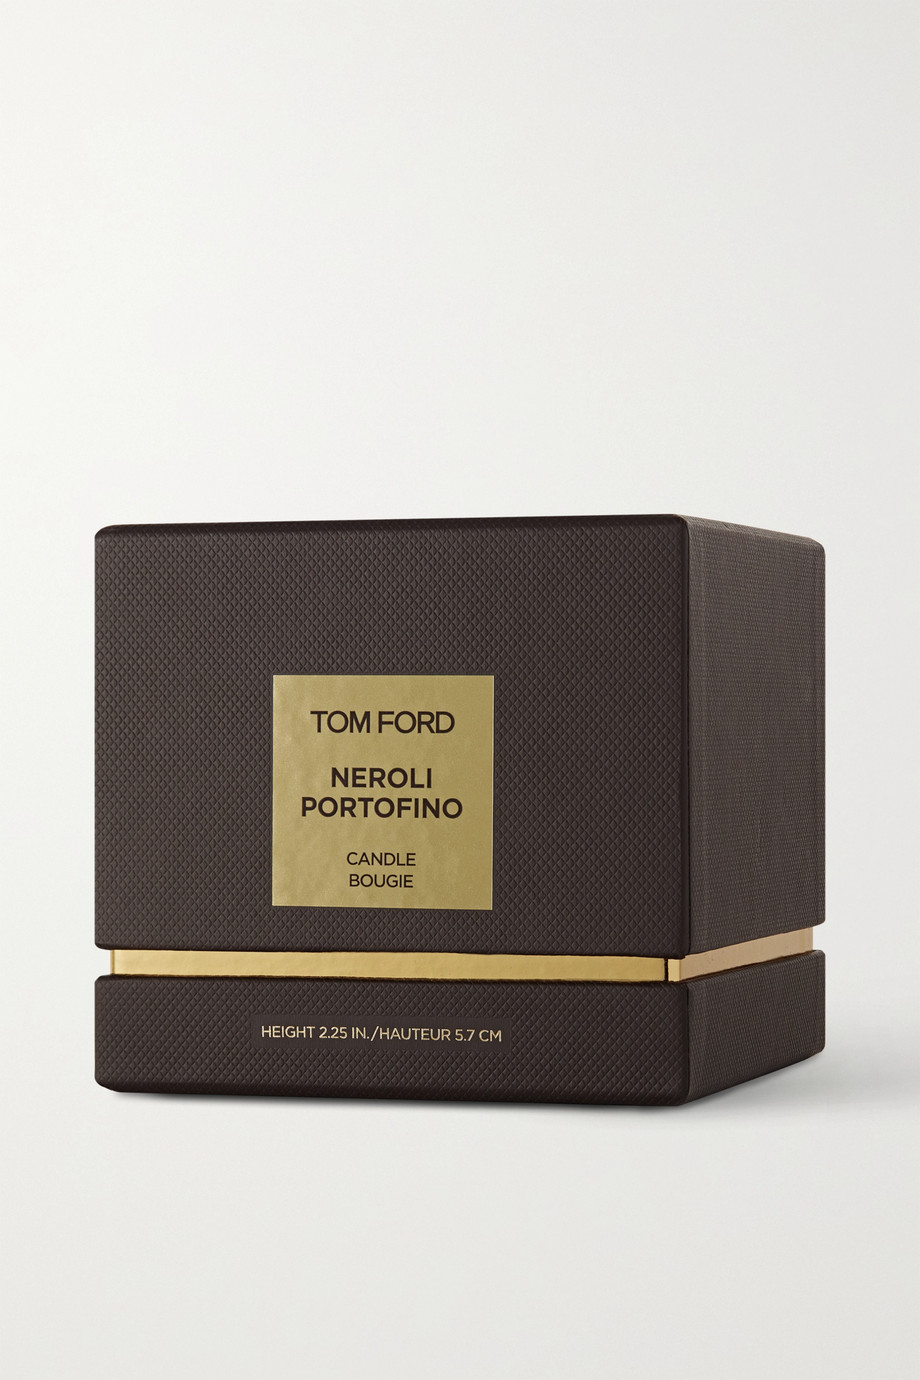 TOM FORD BEAUTY Private Blend Neroli Portofino Candle, 595g